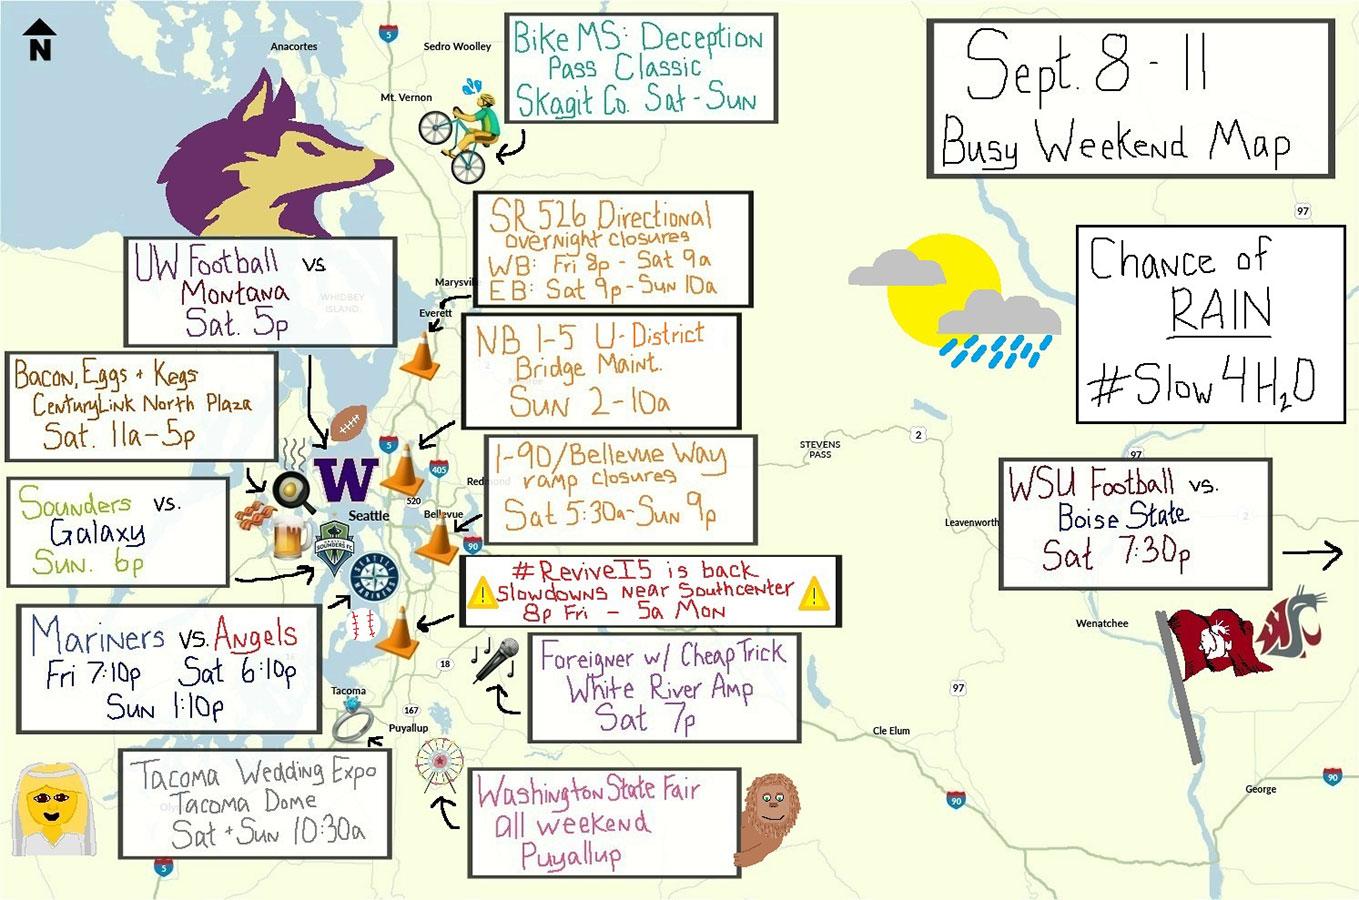 I5 Traffic Map.The Wsdot Blog Washington State Department Of Transportation